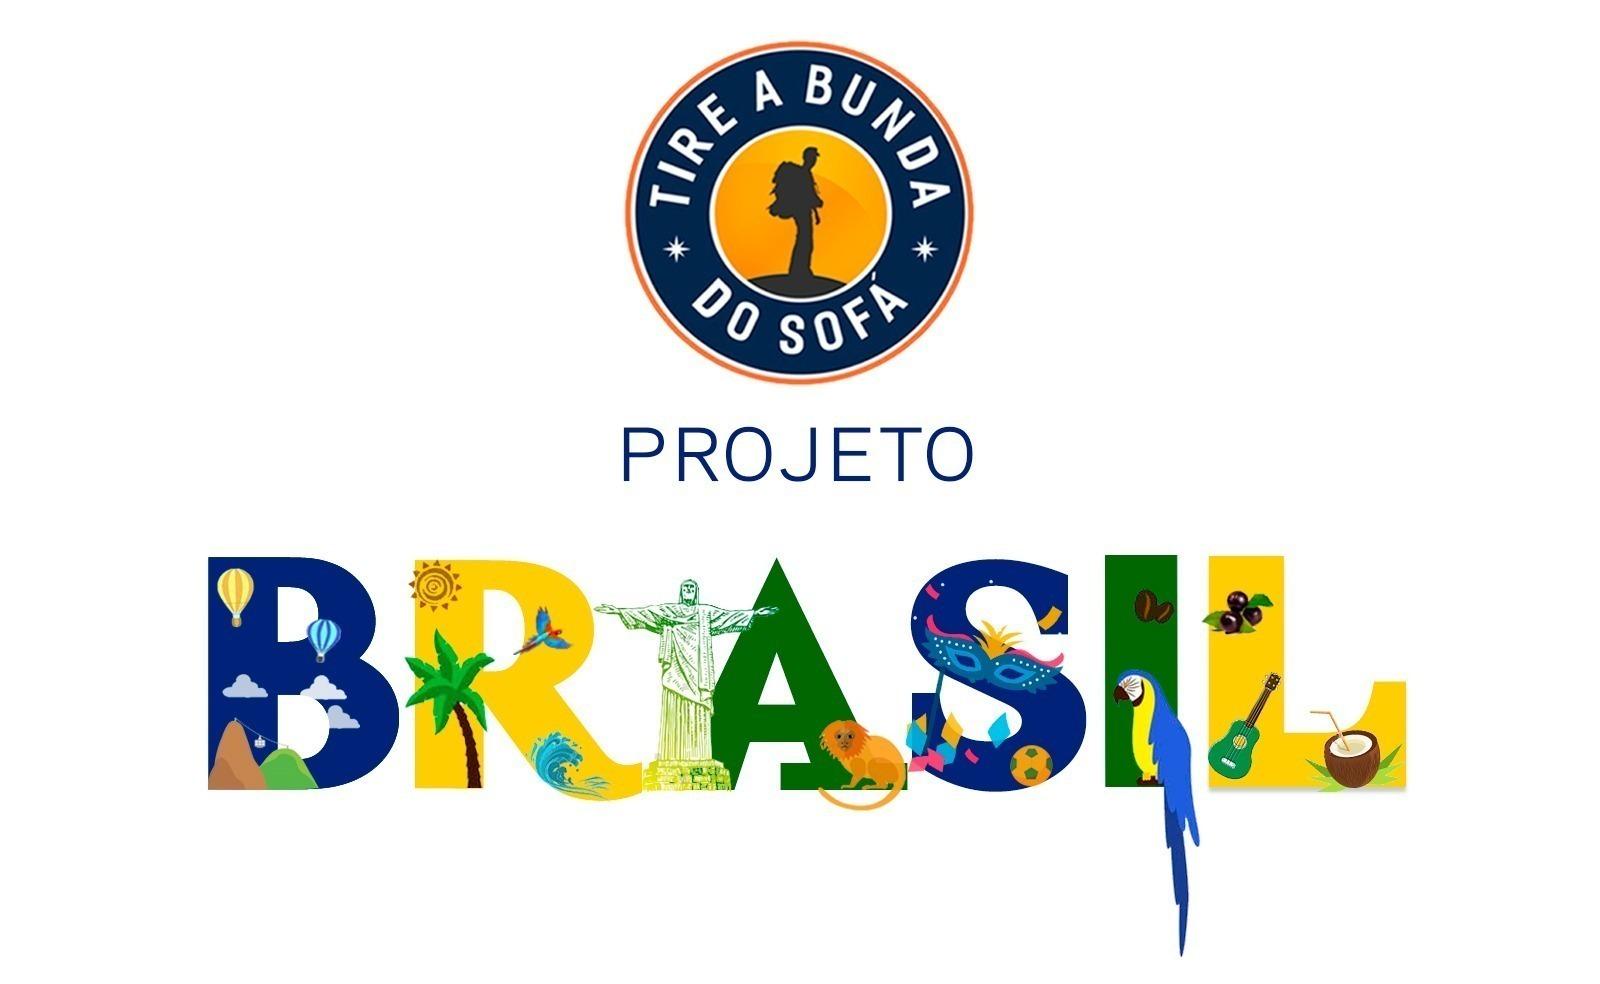 Projeto Brasil Tire a Bunda do Sofá